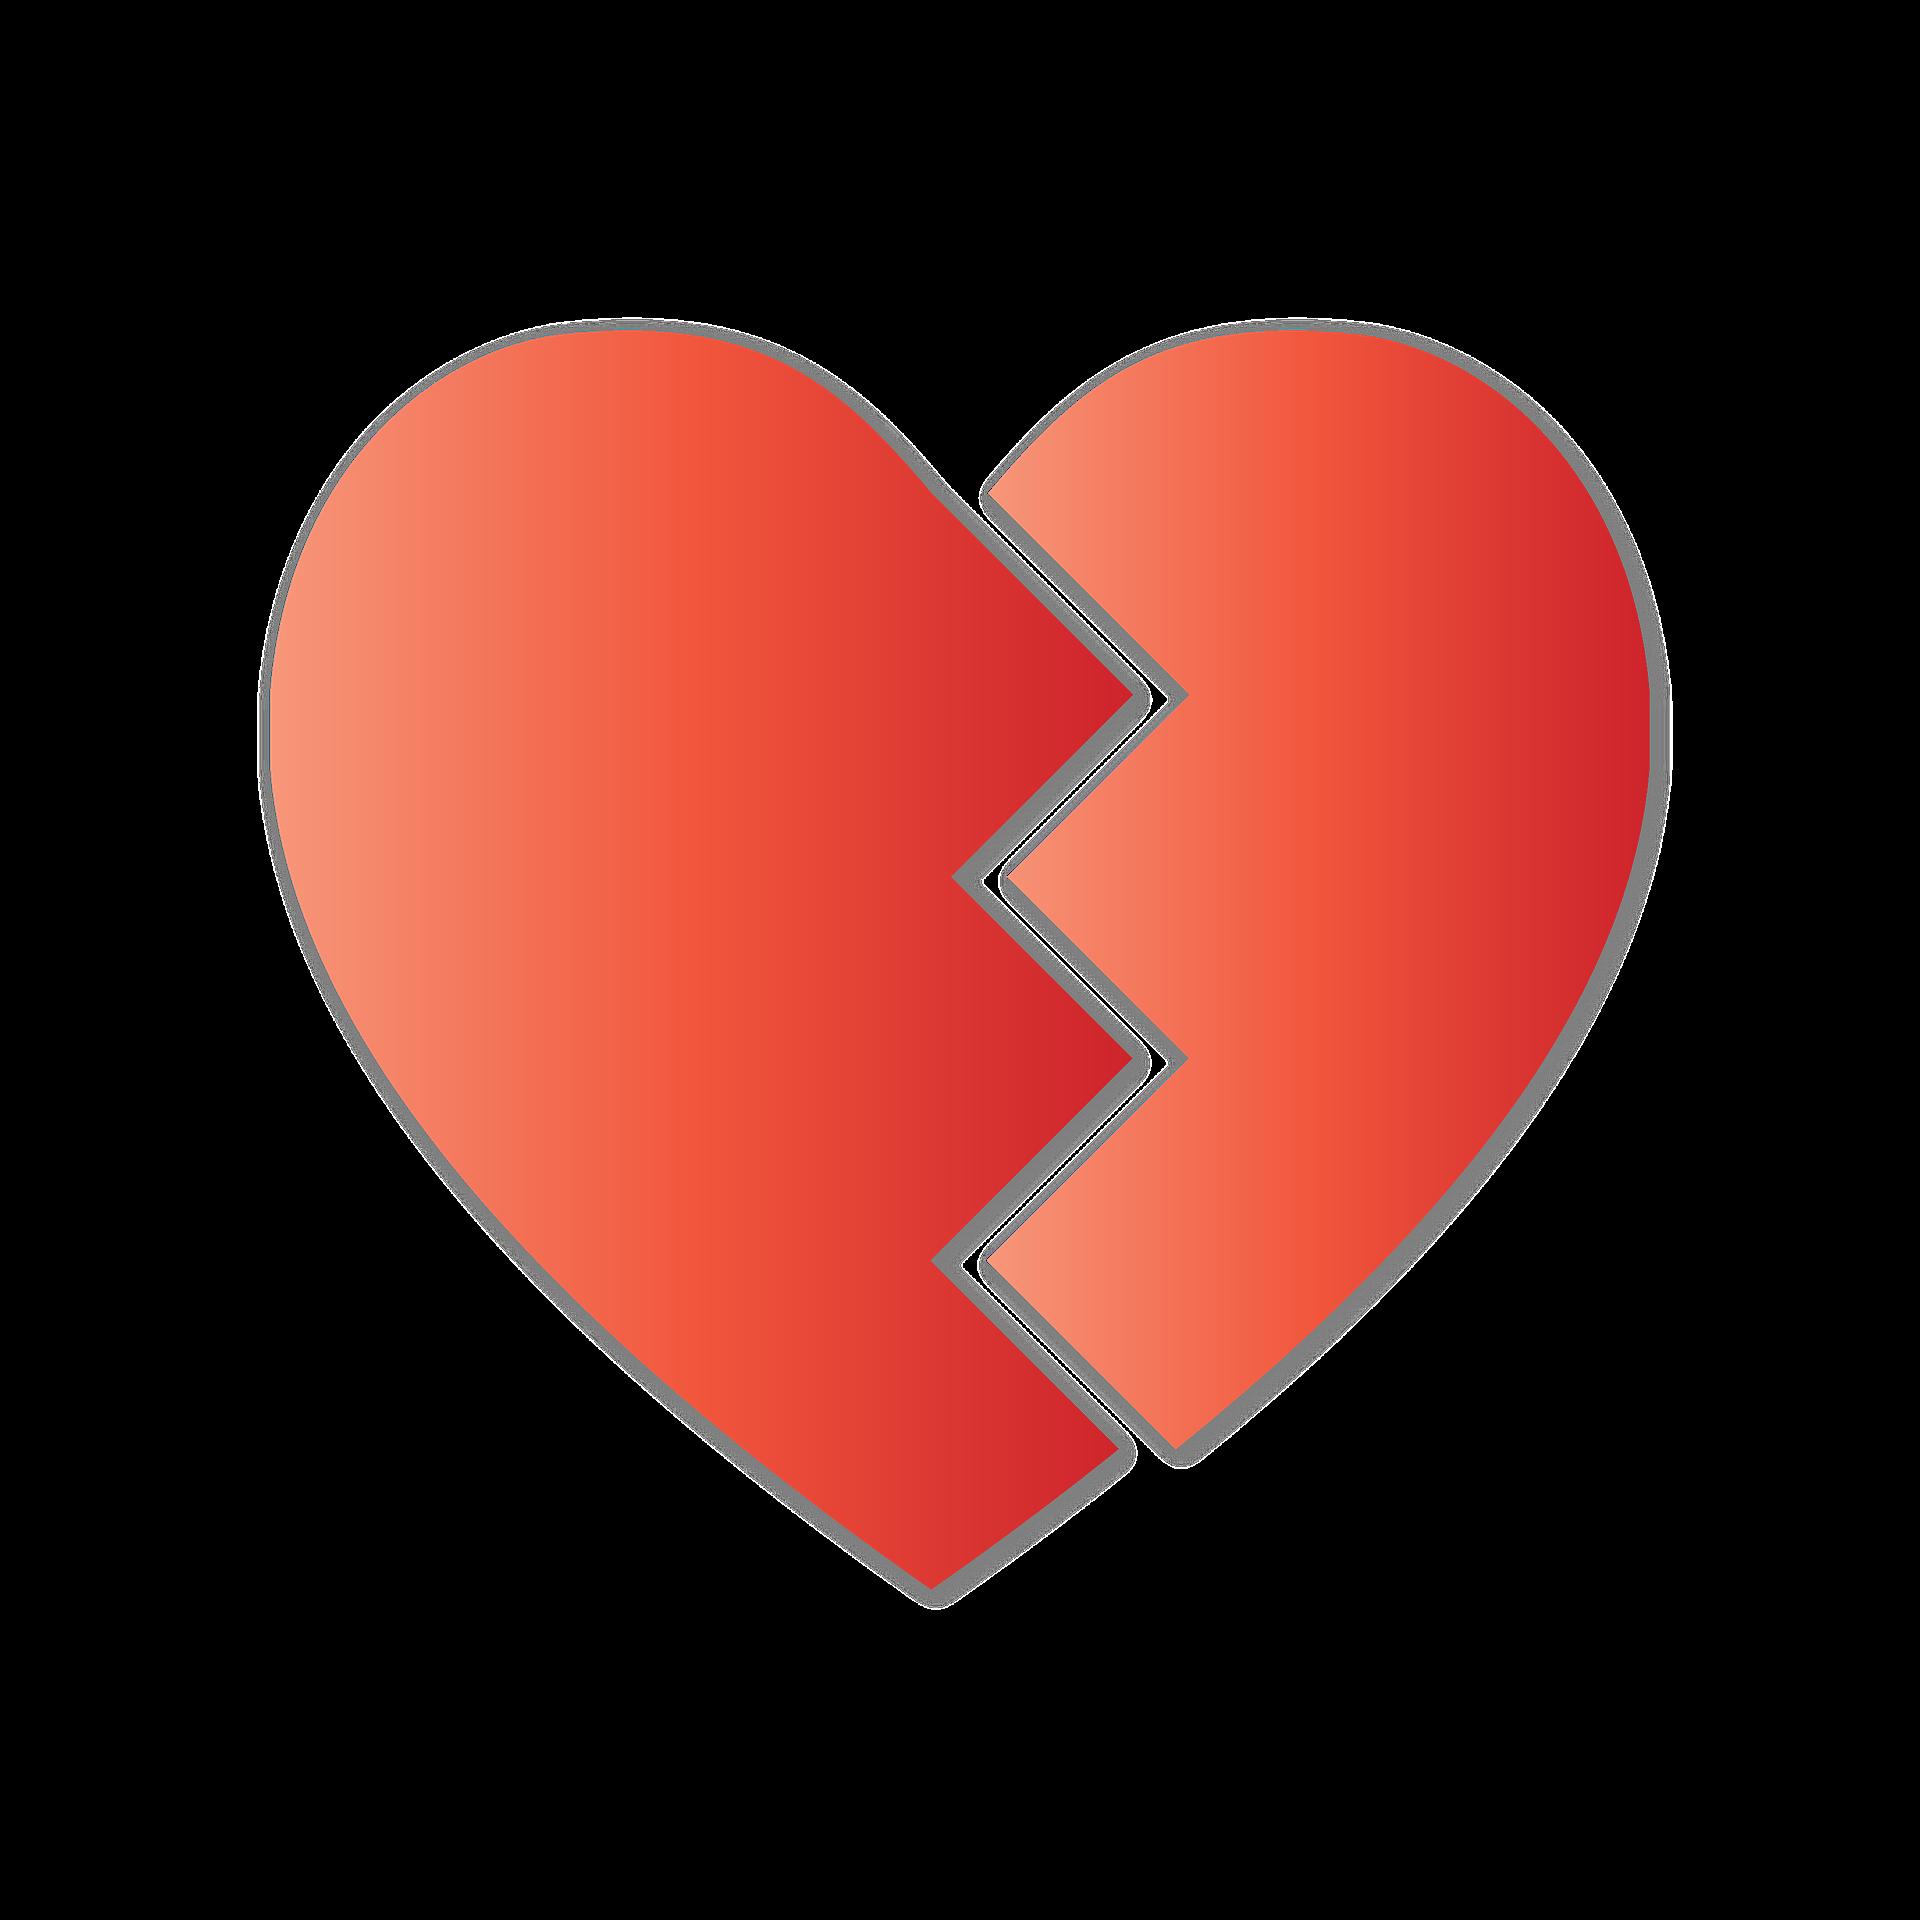 Best friends broken heart clipart graphic freeuse Best Break Up Stories - Salt Lake Magazine graphic freeuse